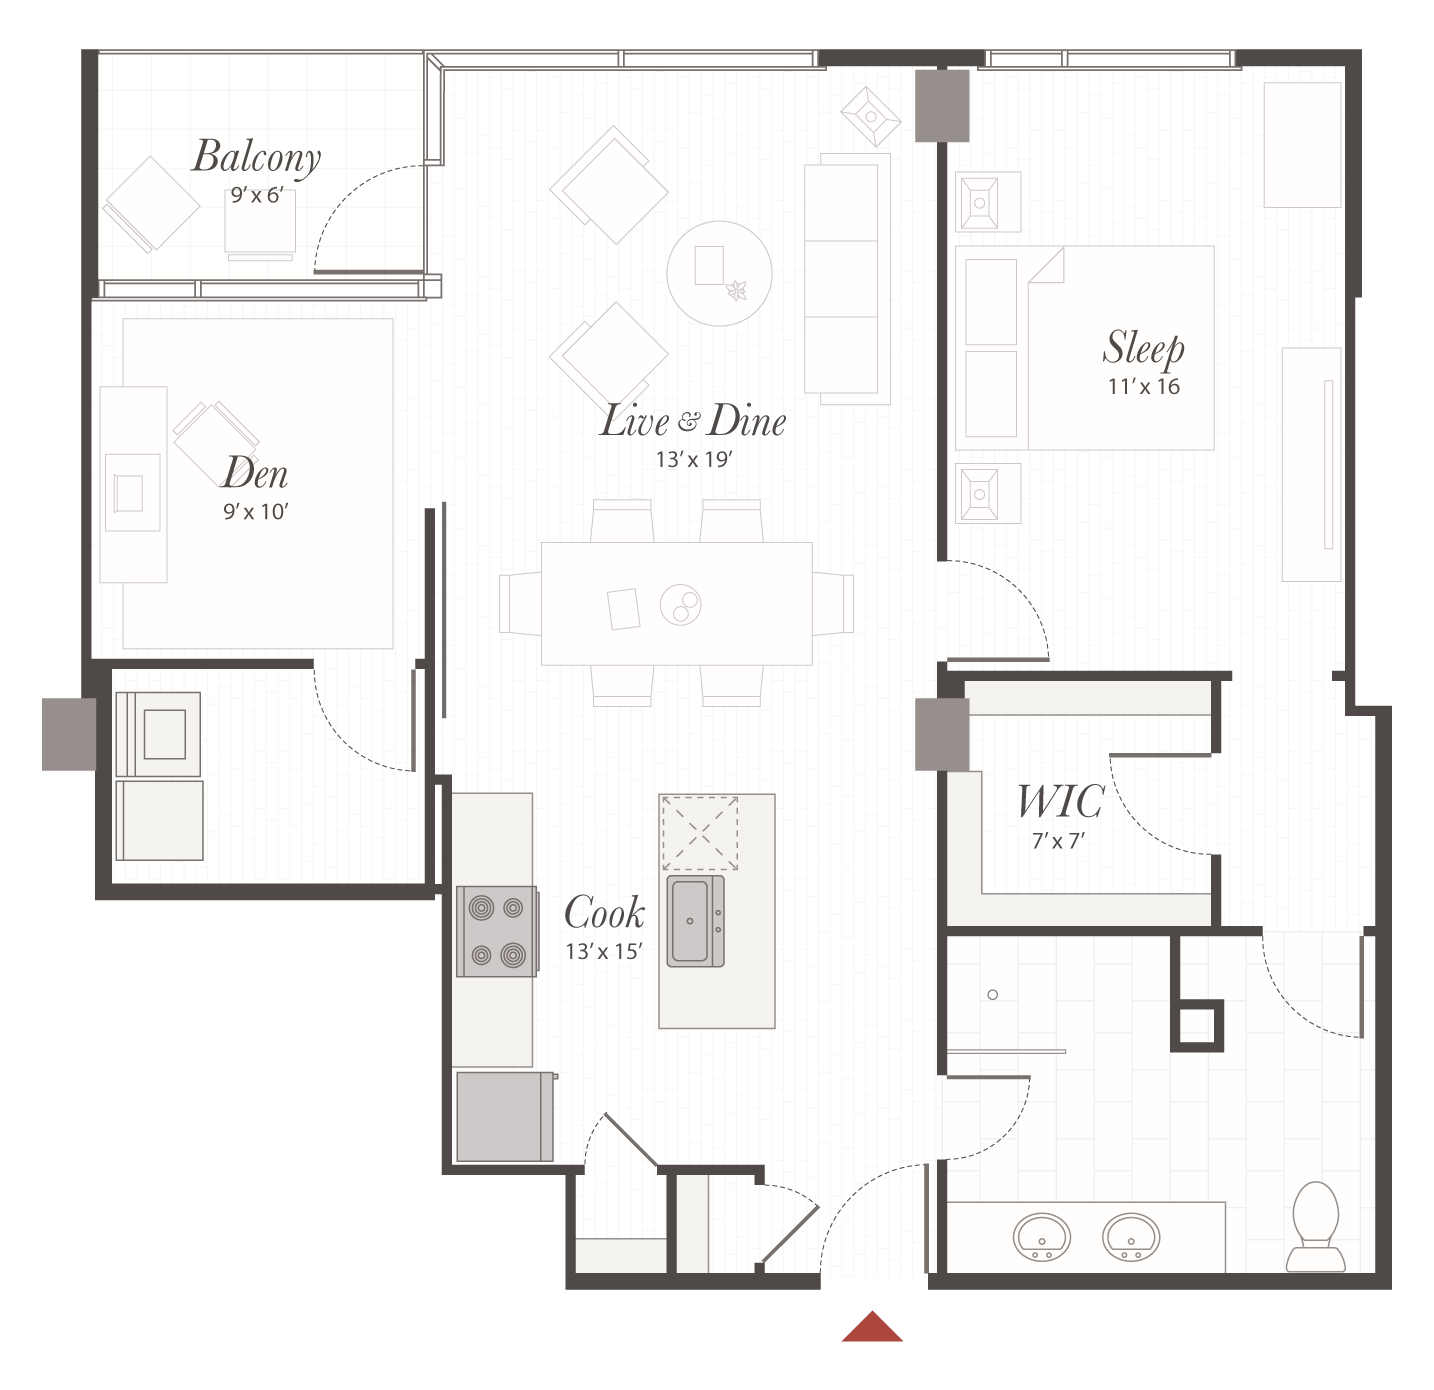 B3 1 Bedroom Apartment Cincinnati Encore Apartments